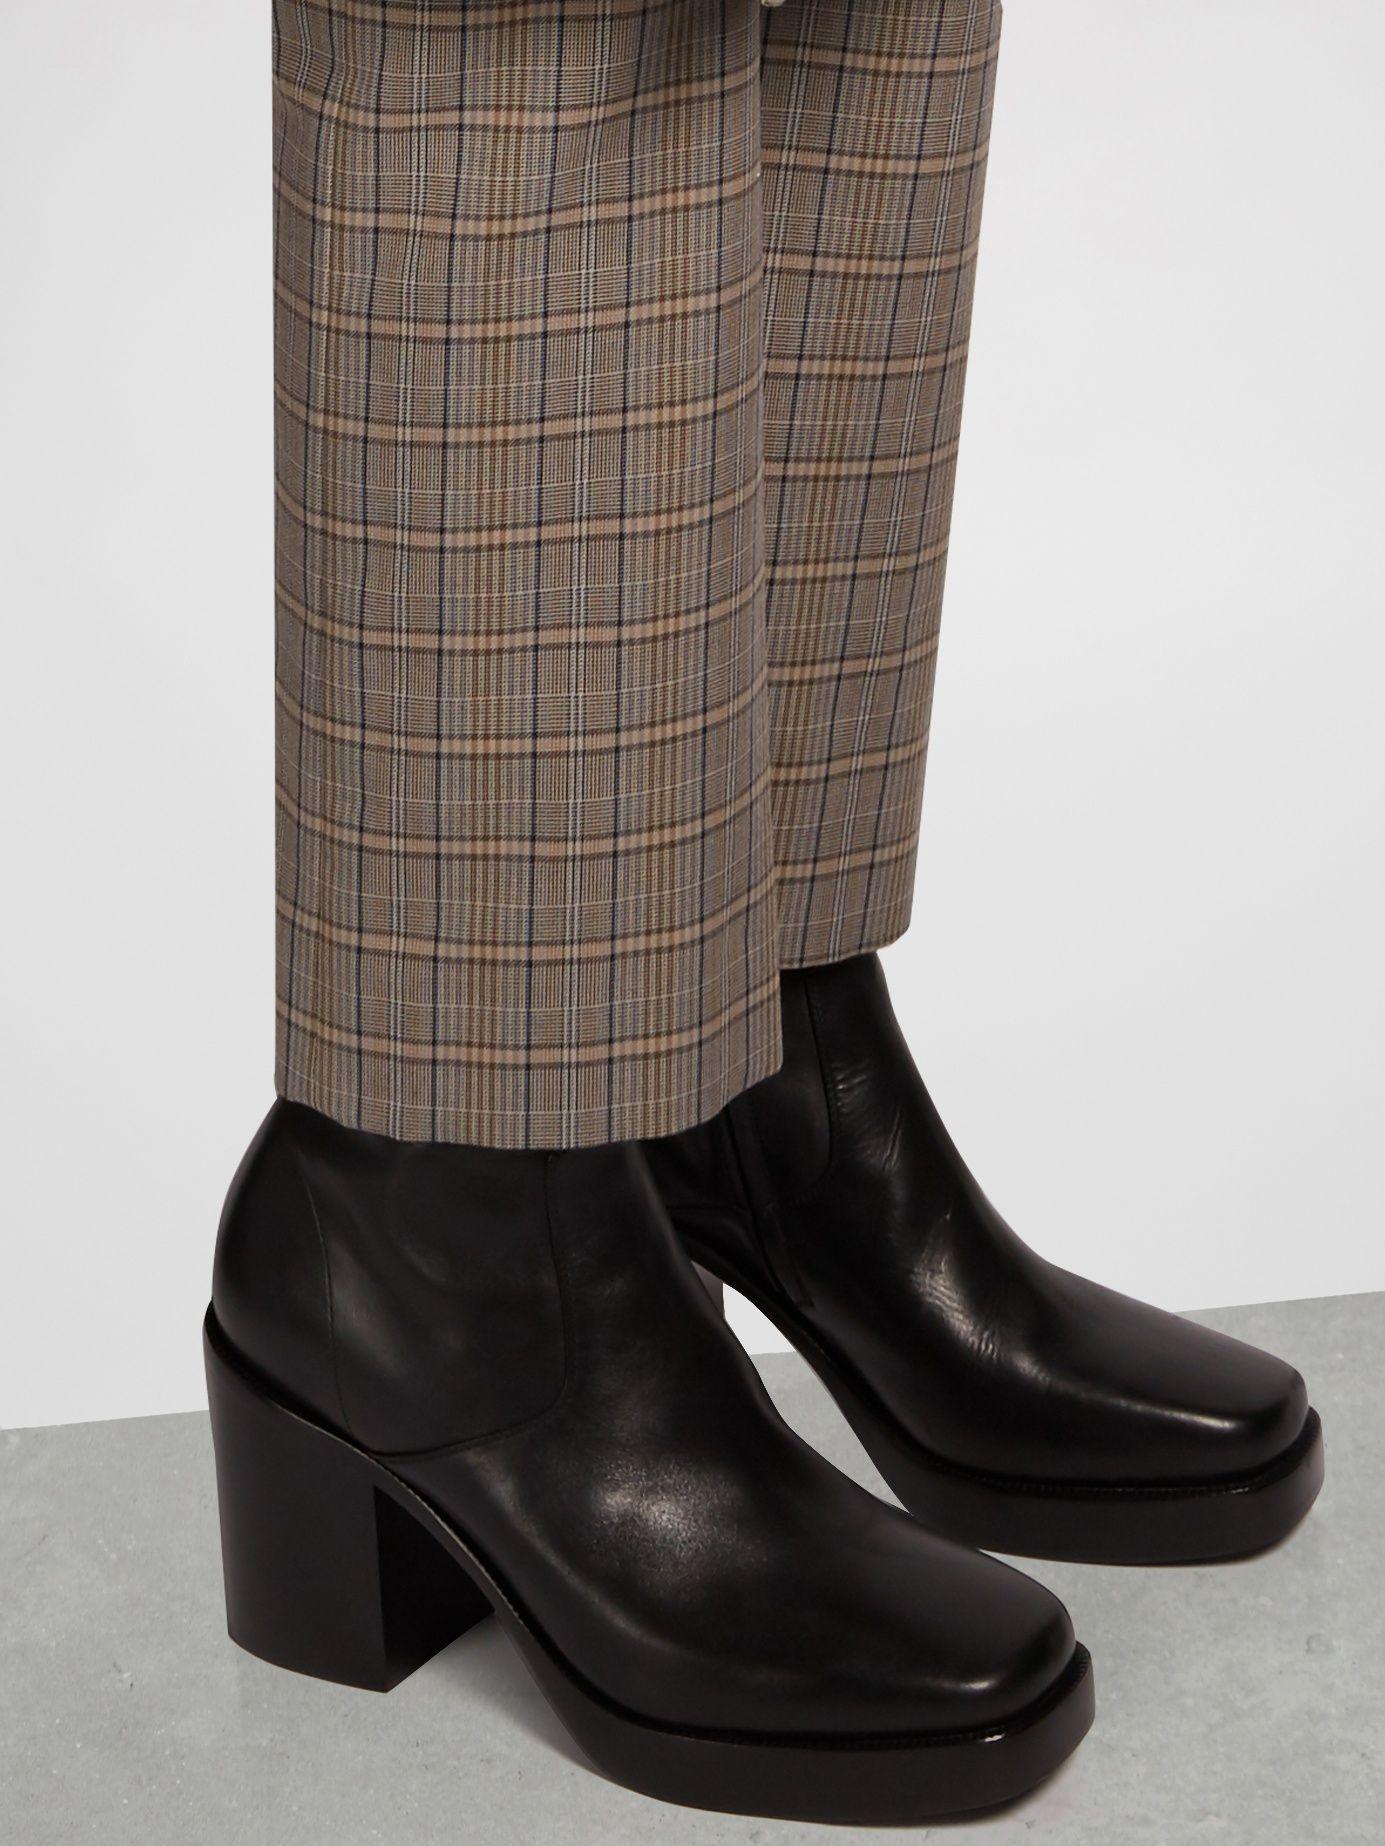 8b0edab0369 Balenciaga Men's Leather Platform Boots | Footwear in 2019 | Boots ...